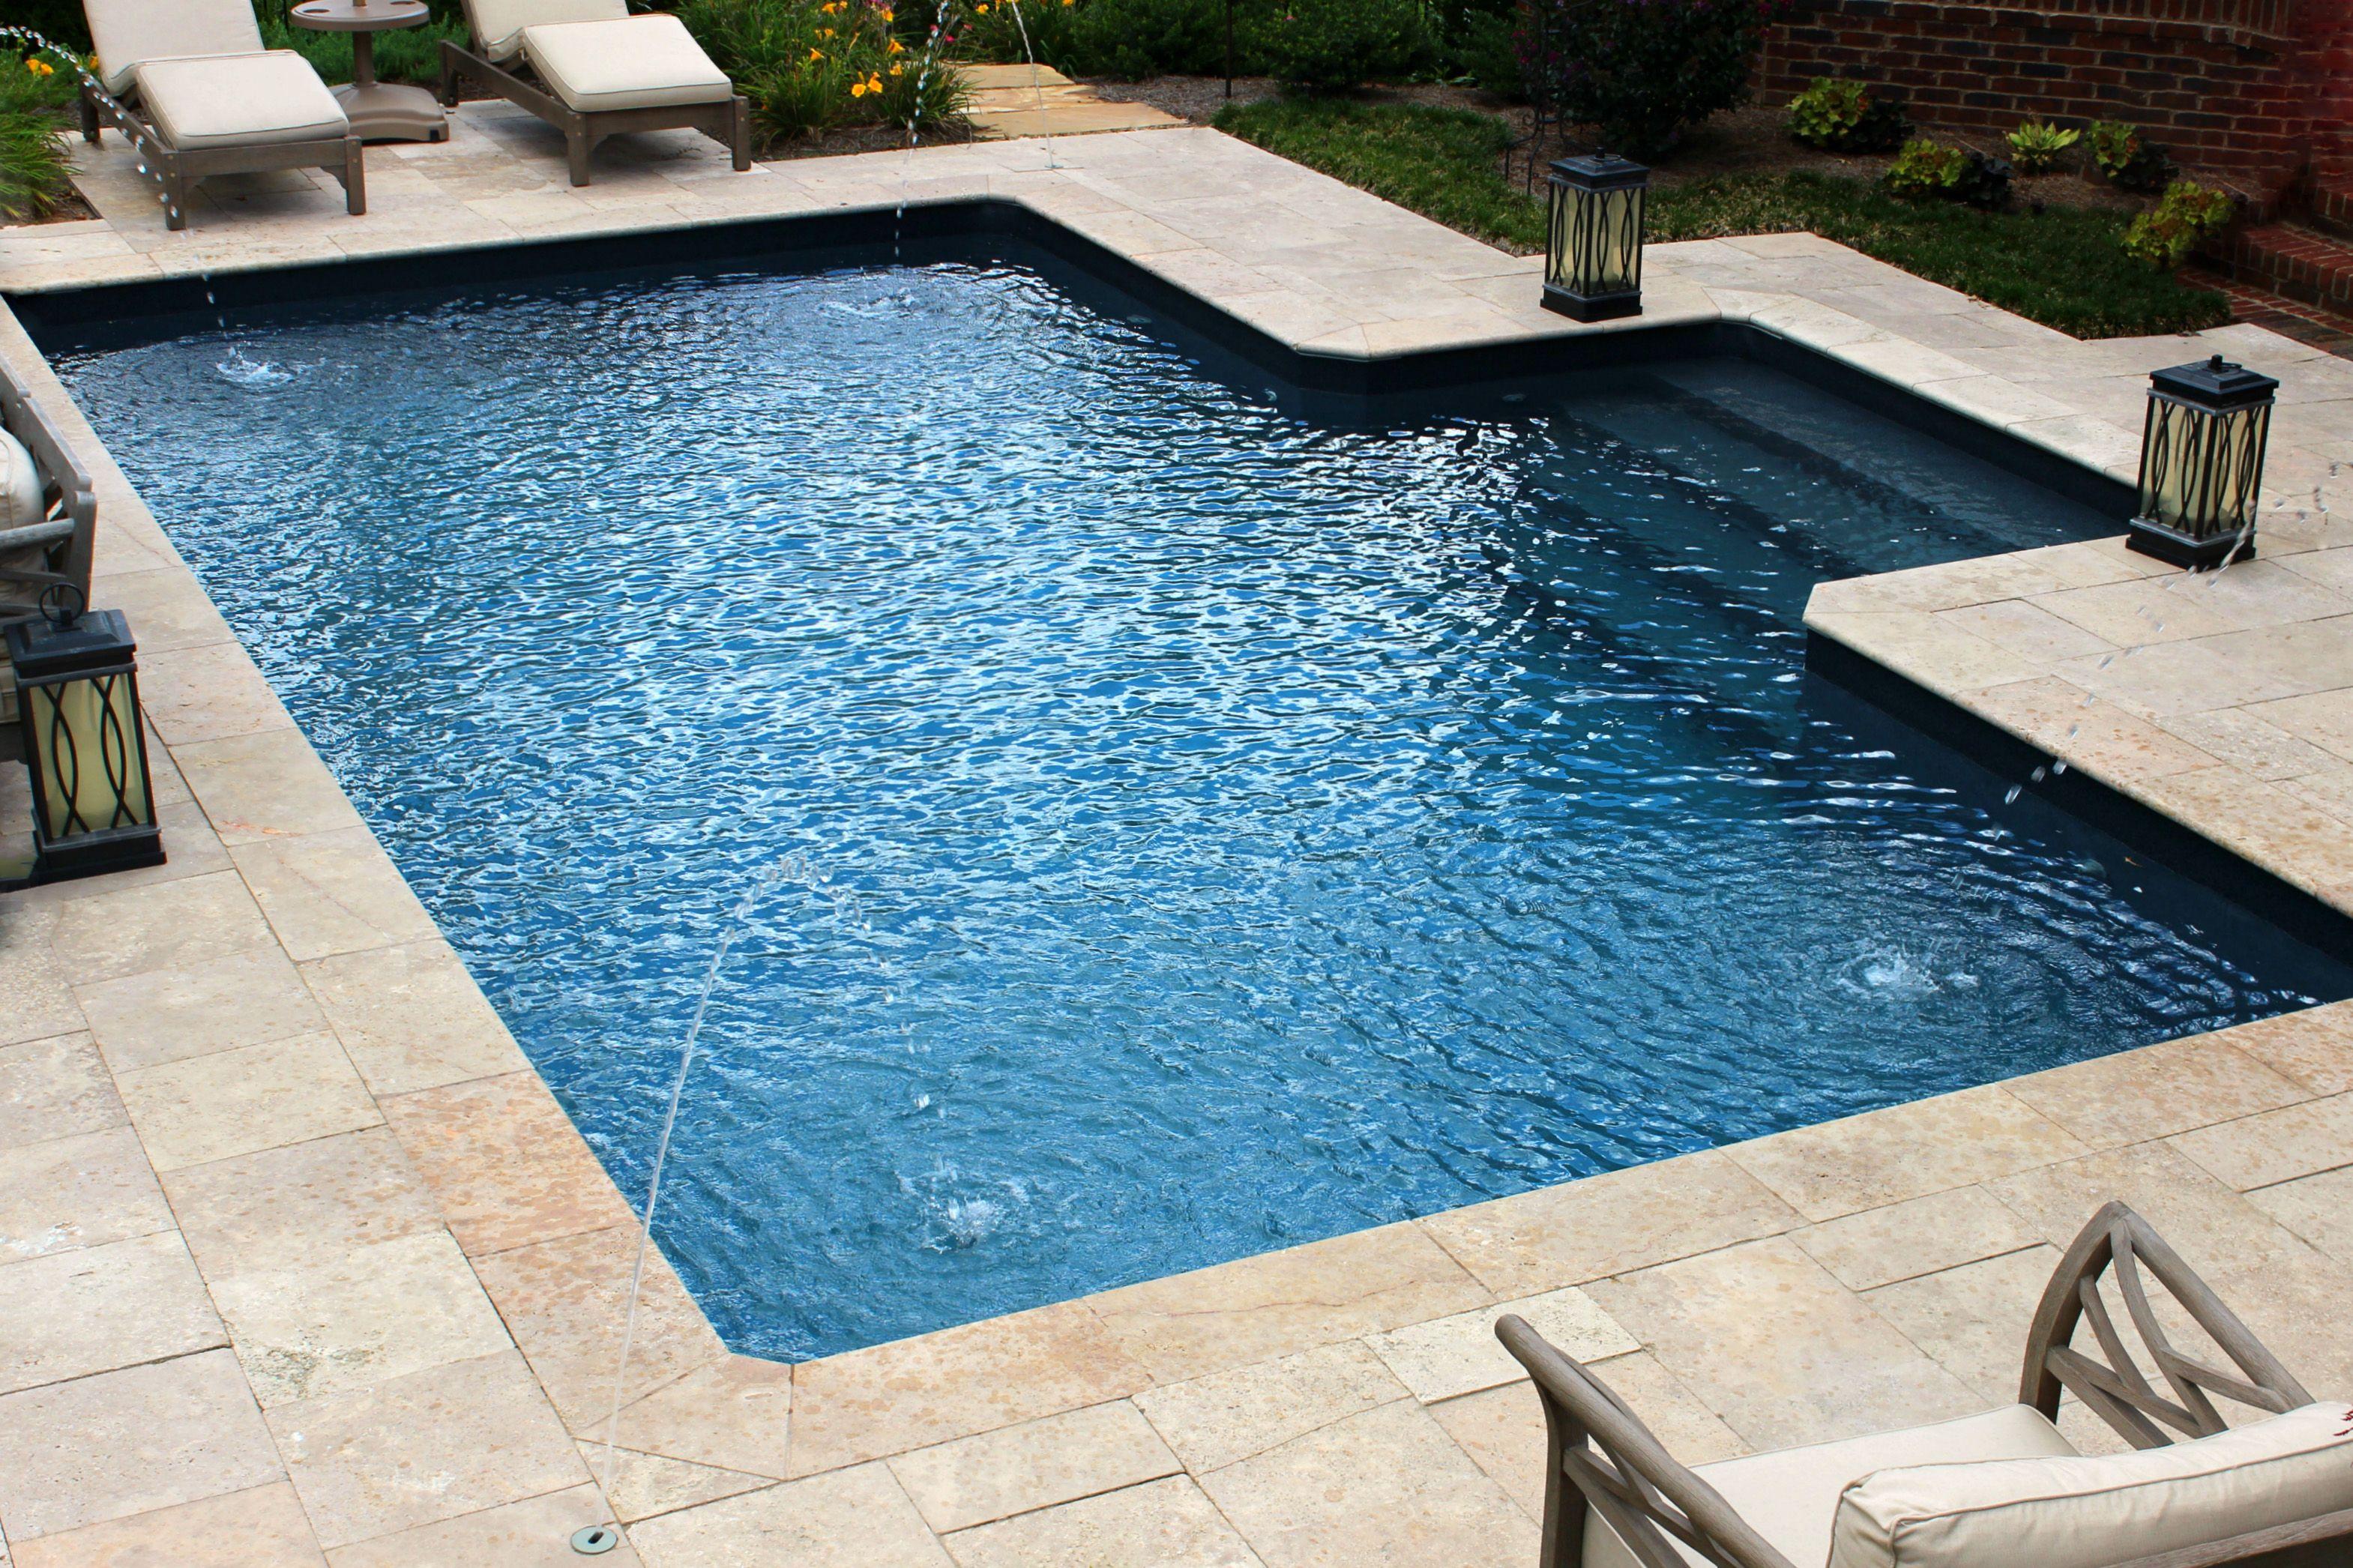 Deep blue, vinyl liner pool, simple design, stair entry, with deck ...